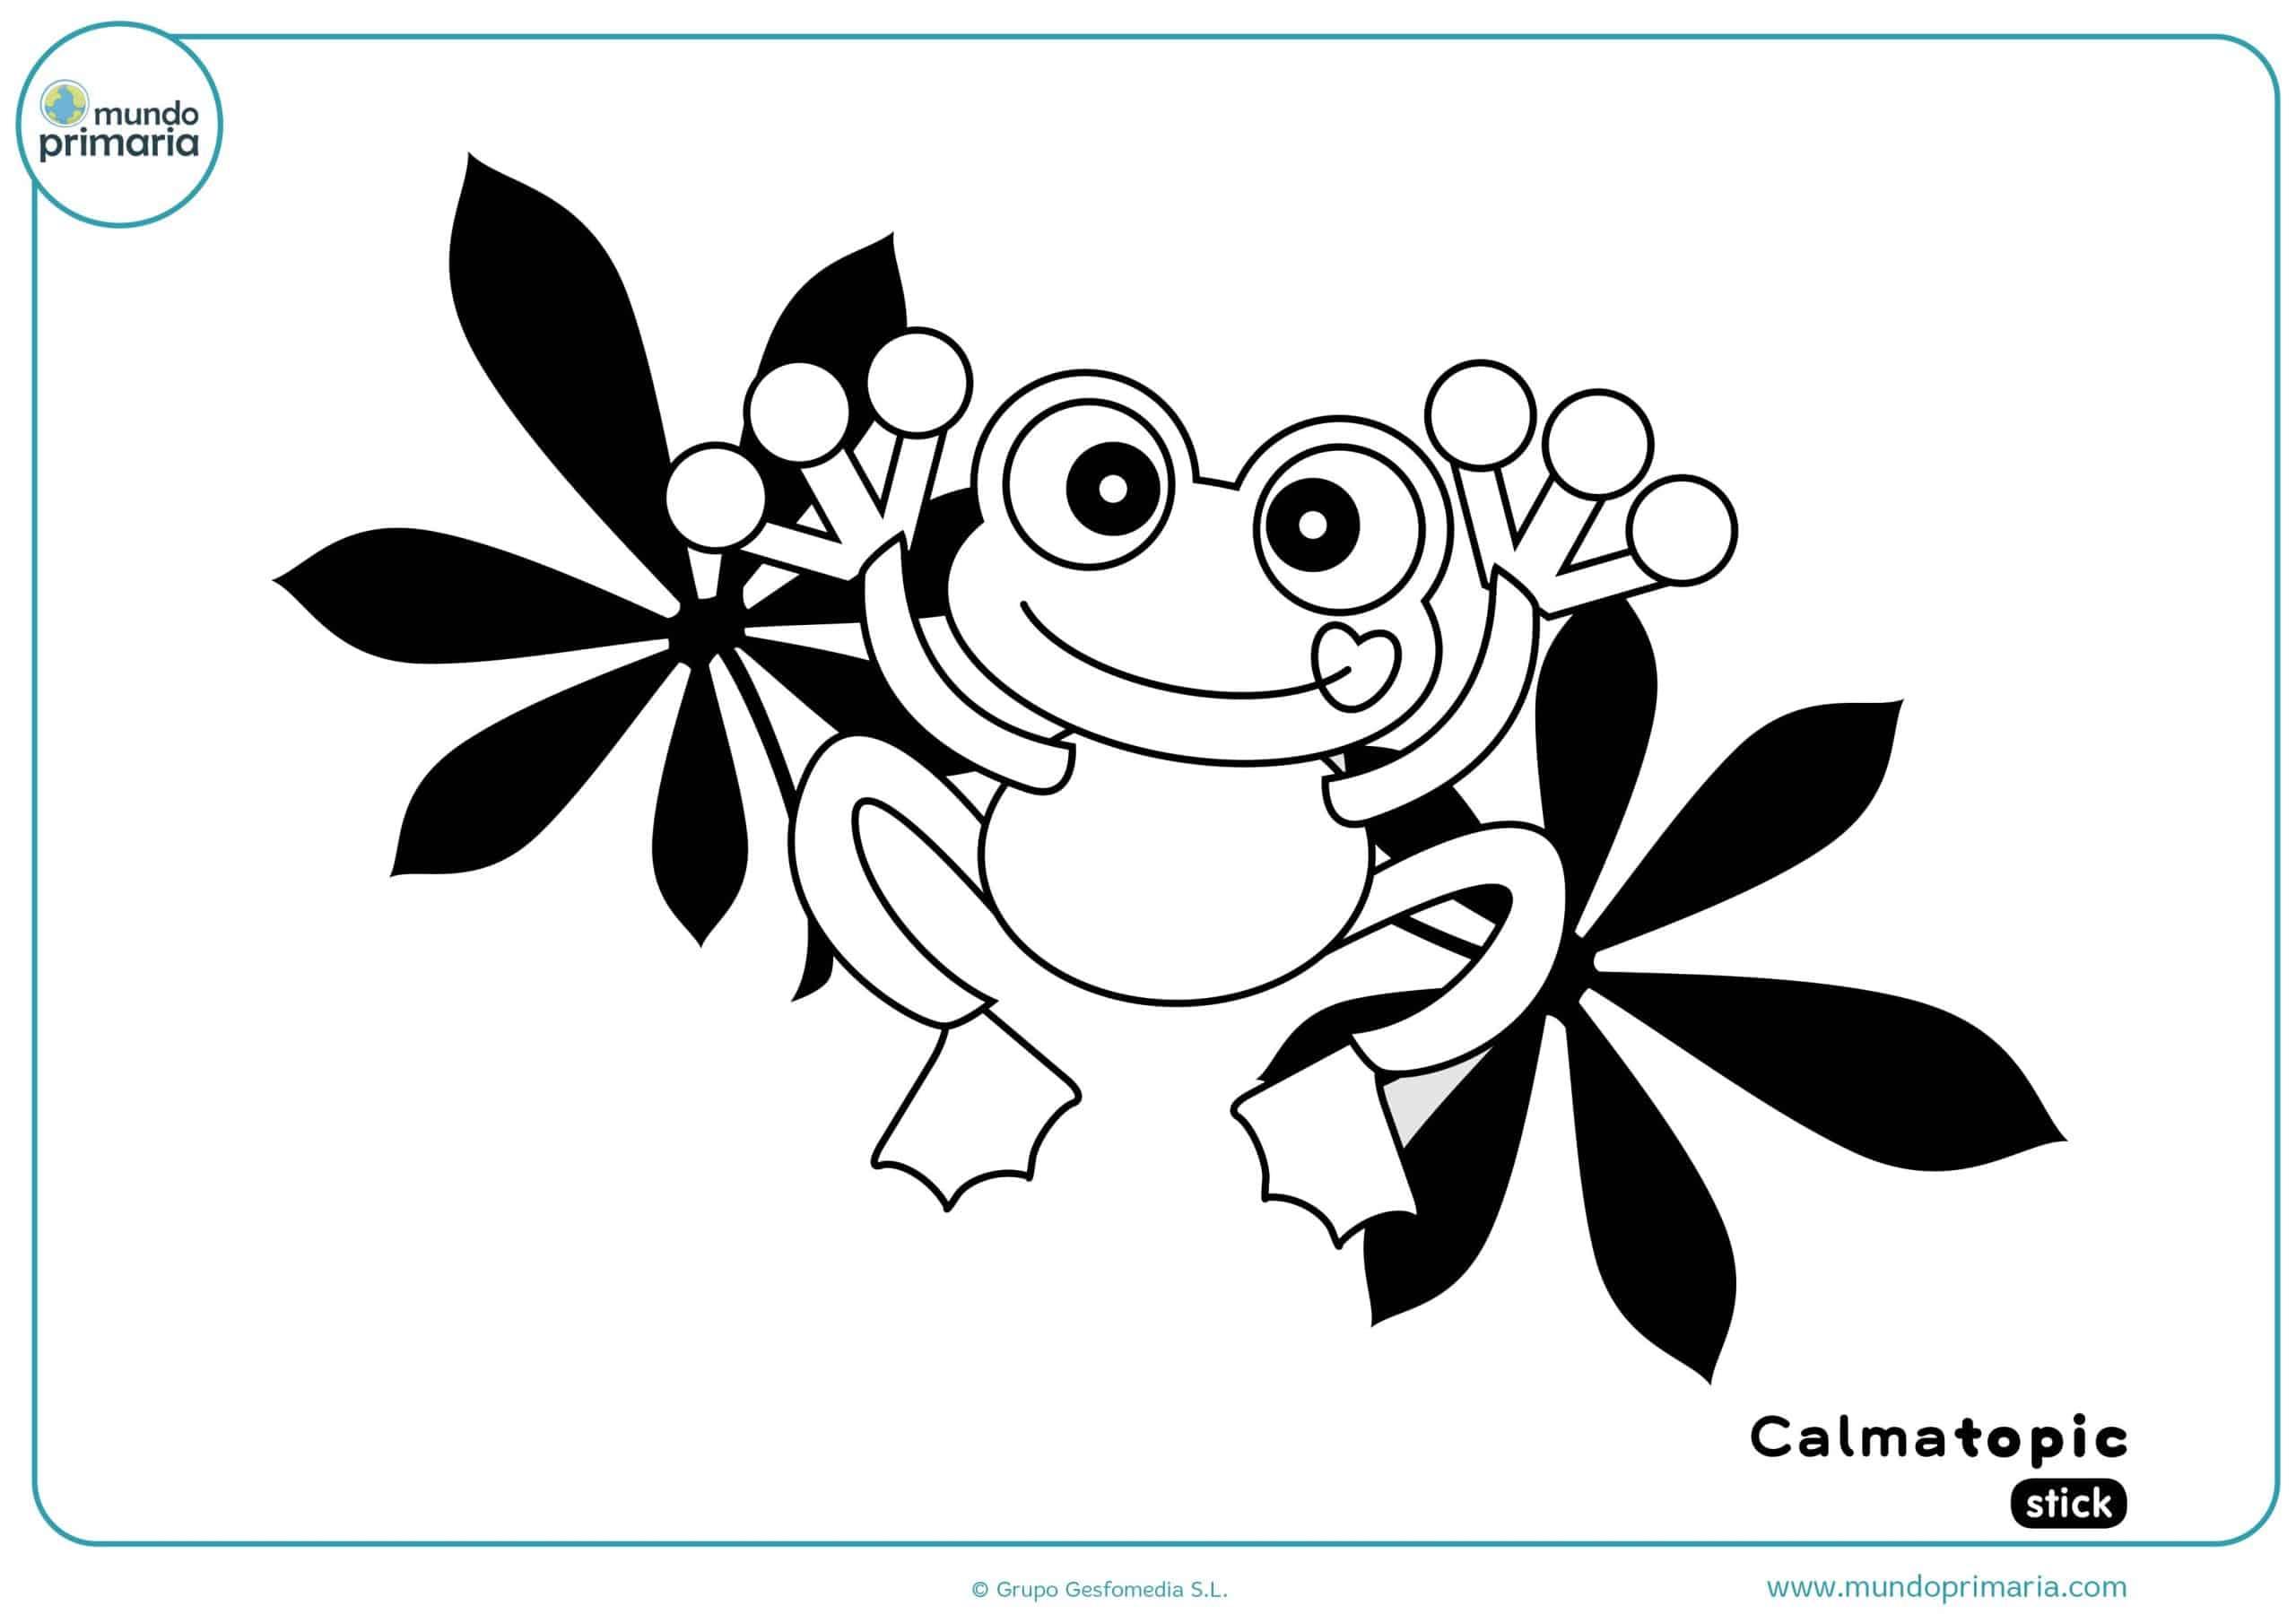 Descárgate la divertida ficha para colorear la ranita de Calmatopic